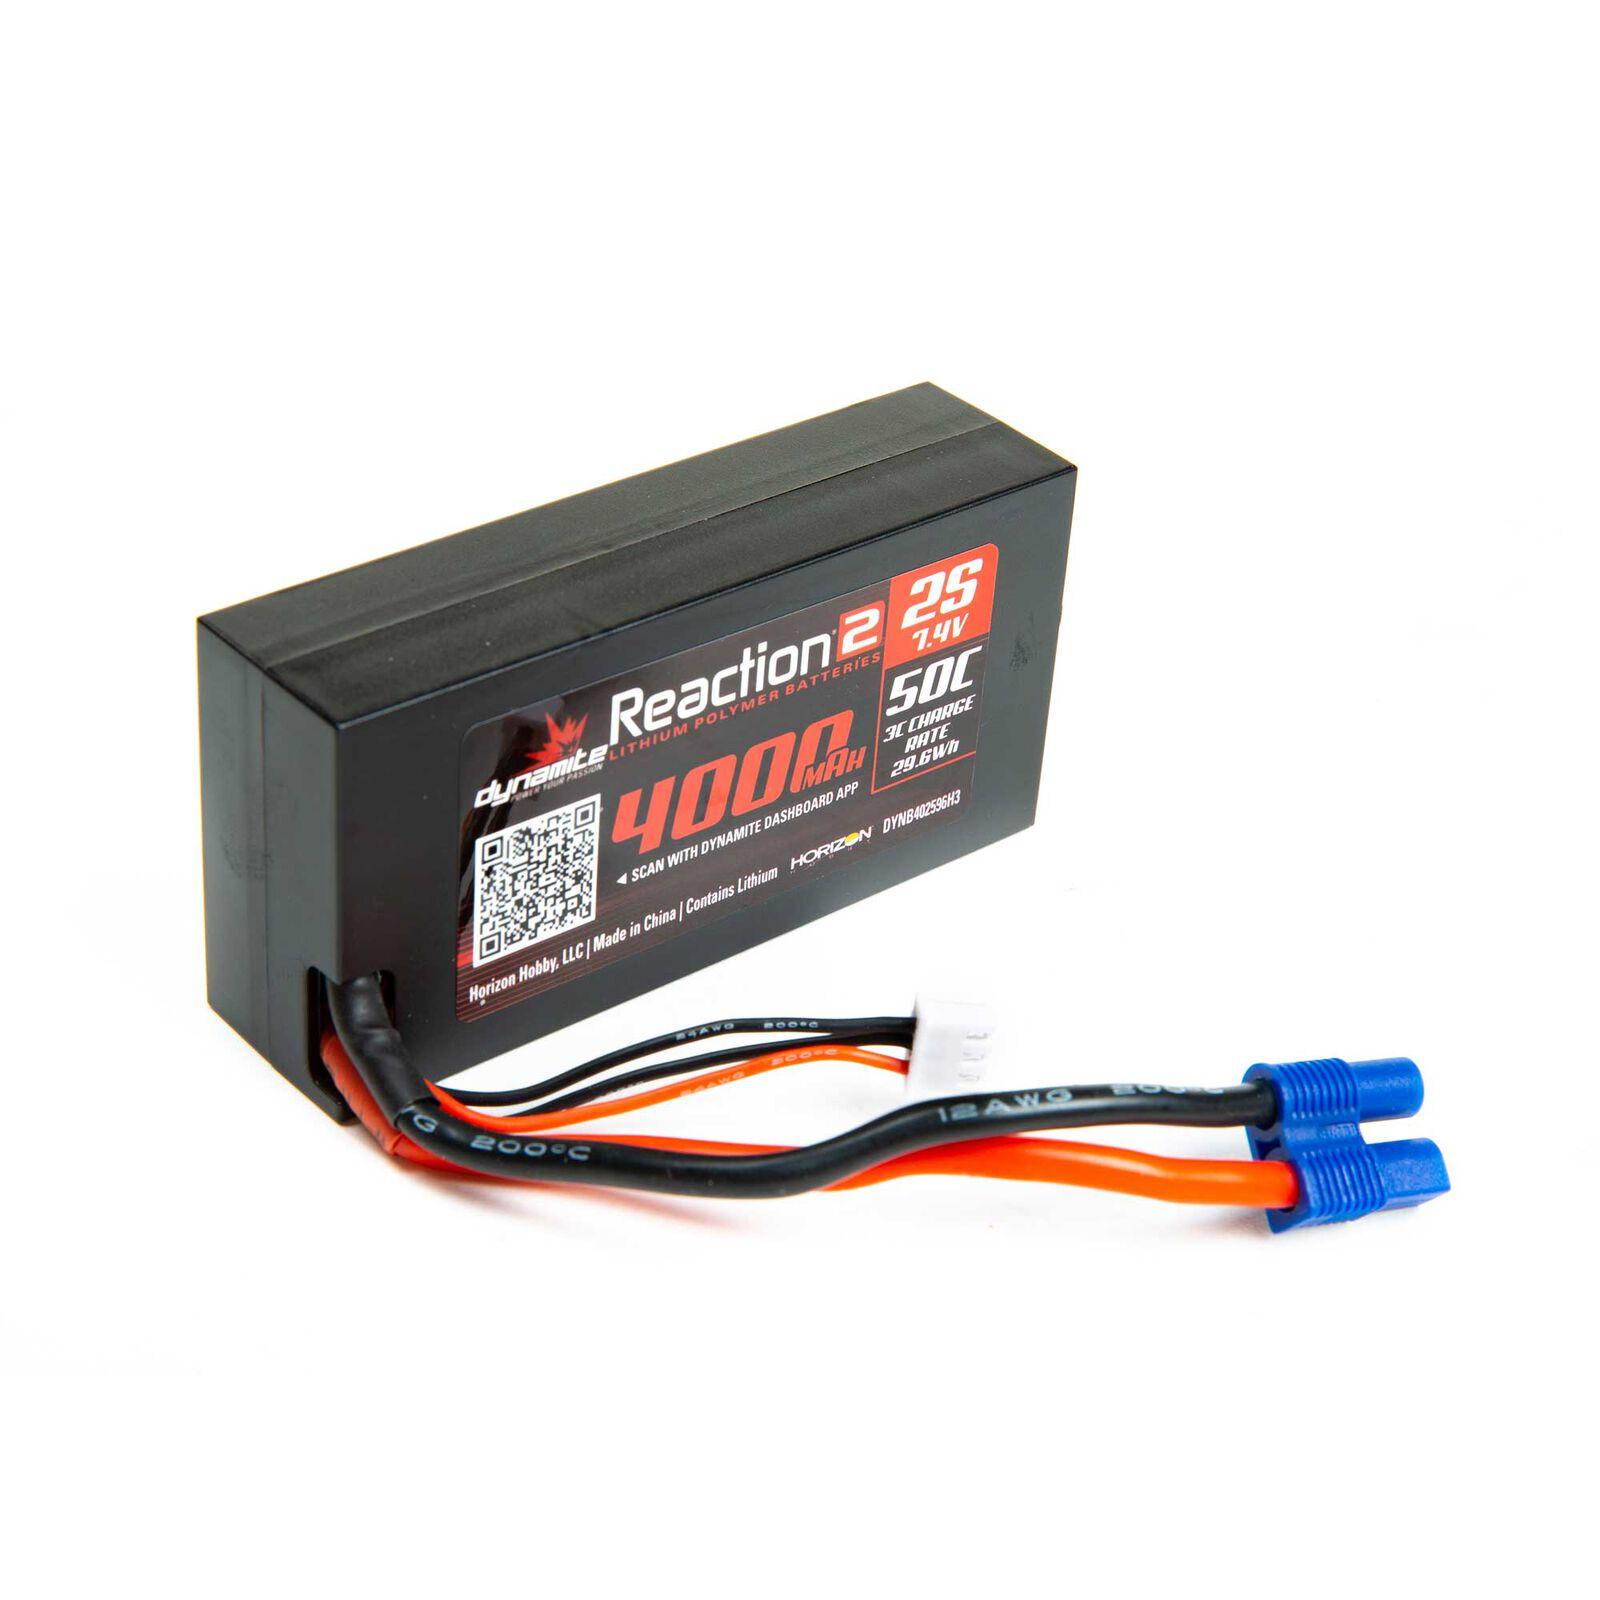 7.4V 4000mAh 2S 50C Reaction 2.0 Hardcase LiPo Battery: EC3